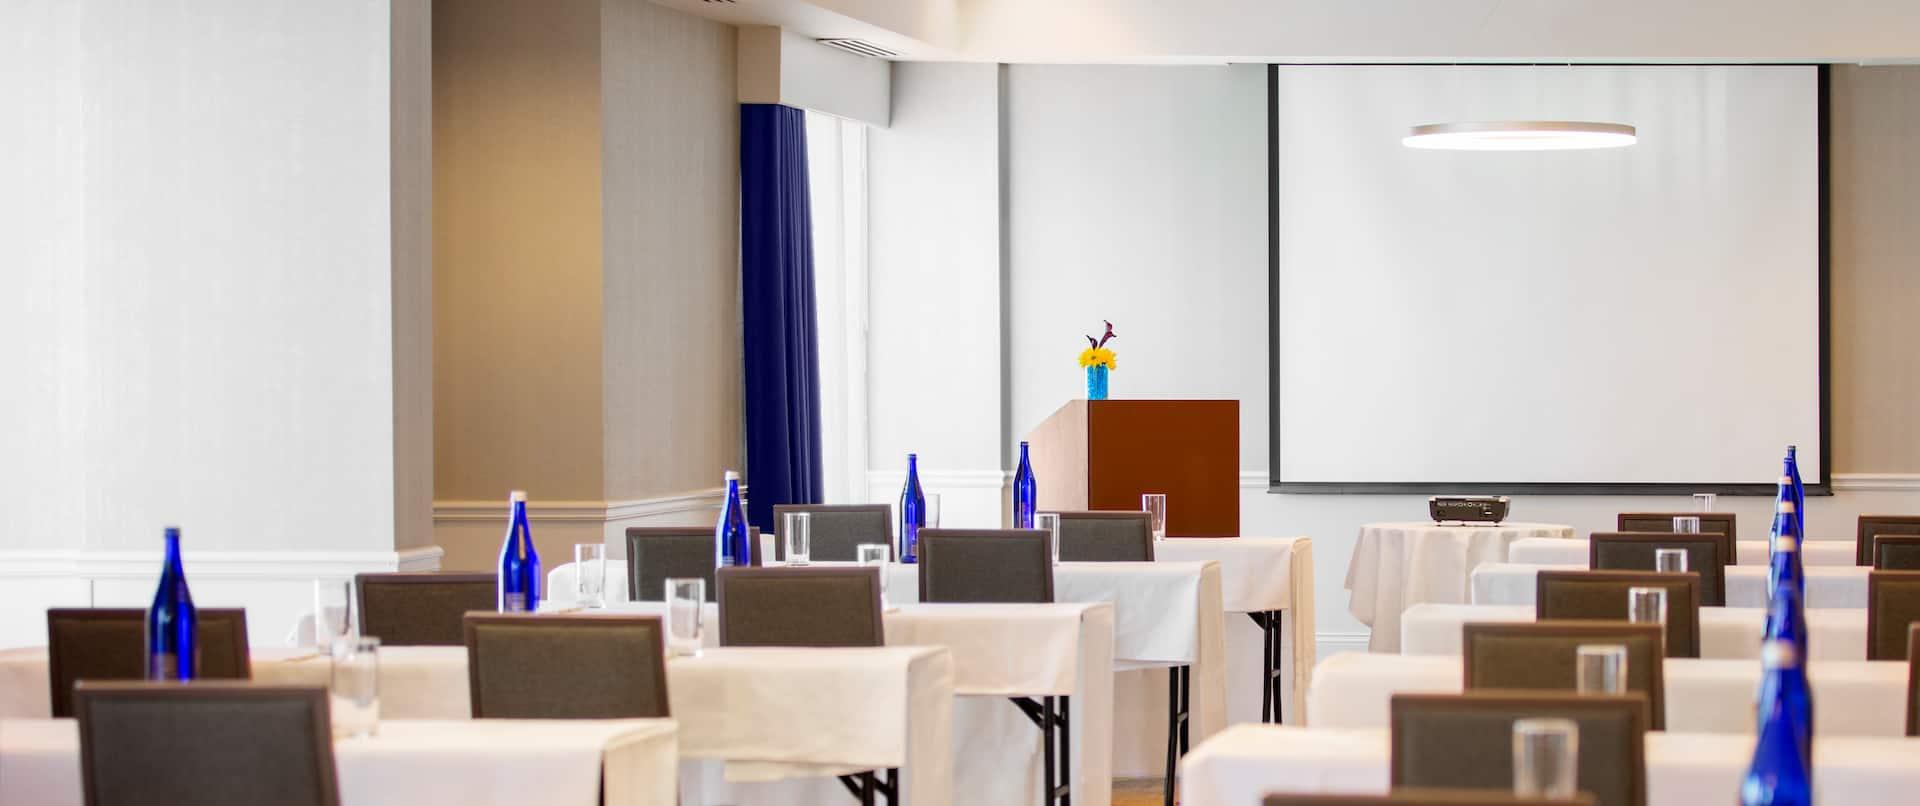 Grand Salon Meeting Room, Classroom